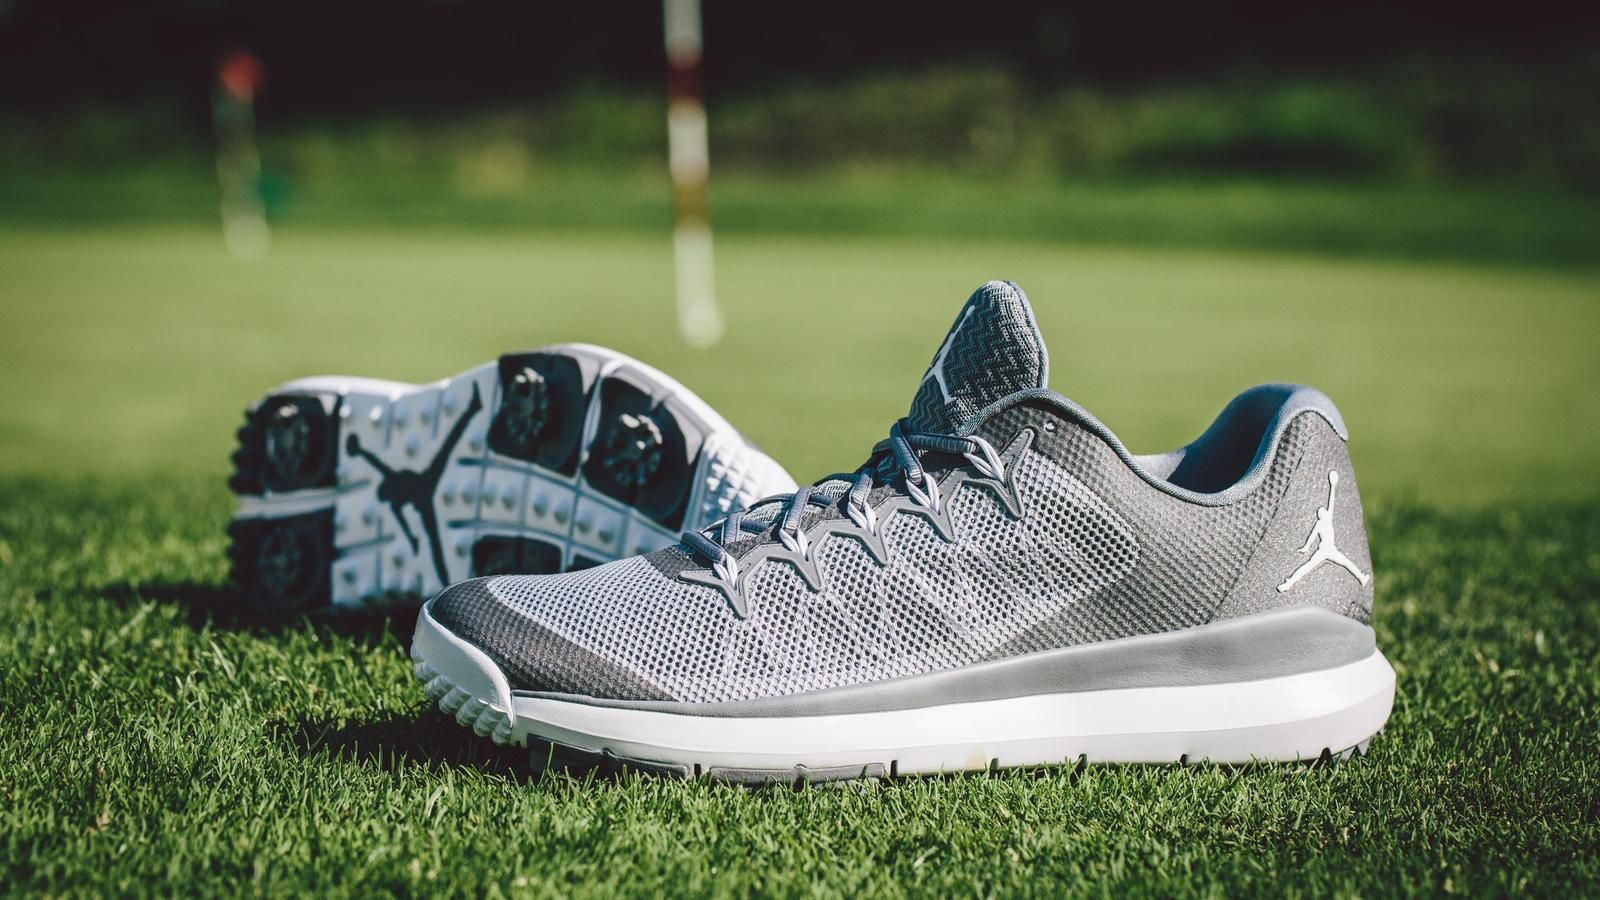 6d096b448cac62 Nike News - Jordan Brand Steps Onto The Green With Jordan Flight Runner Golf  shoe